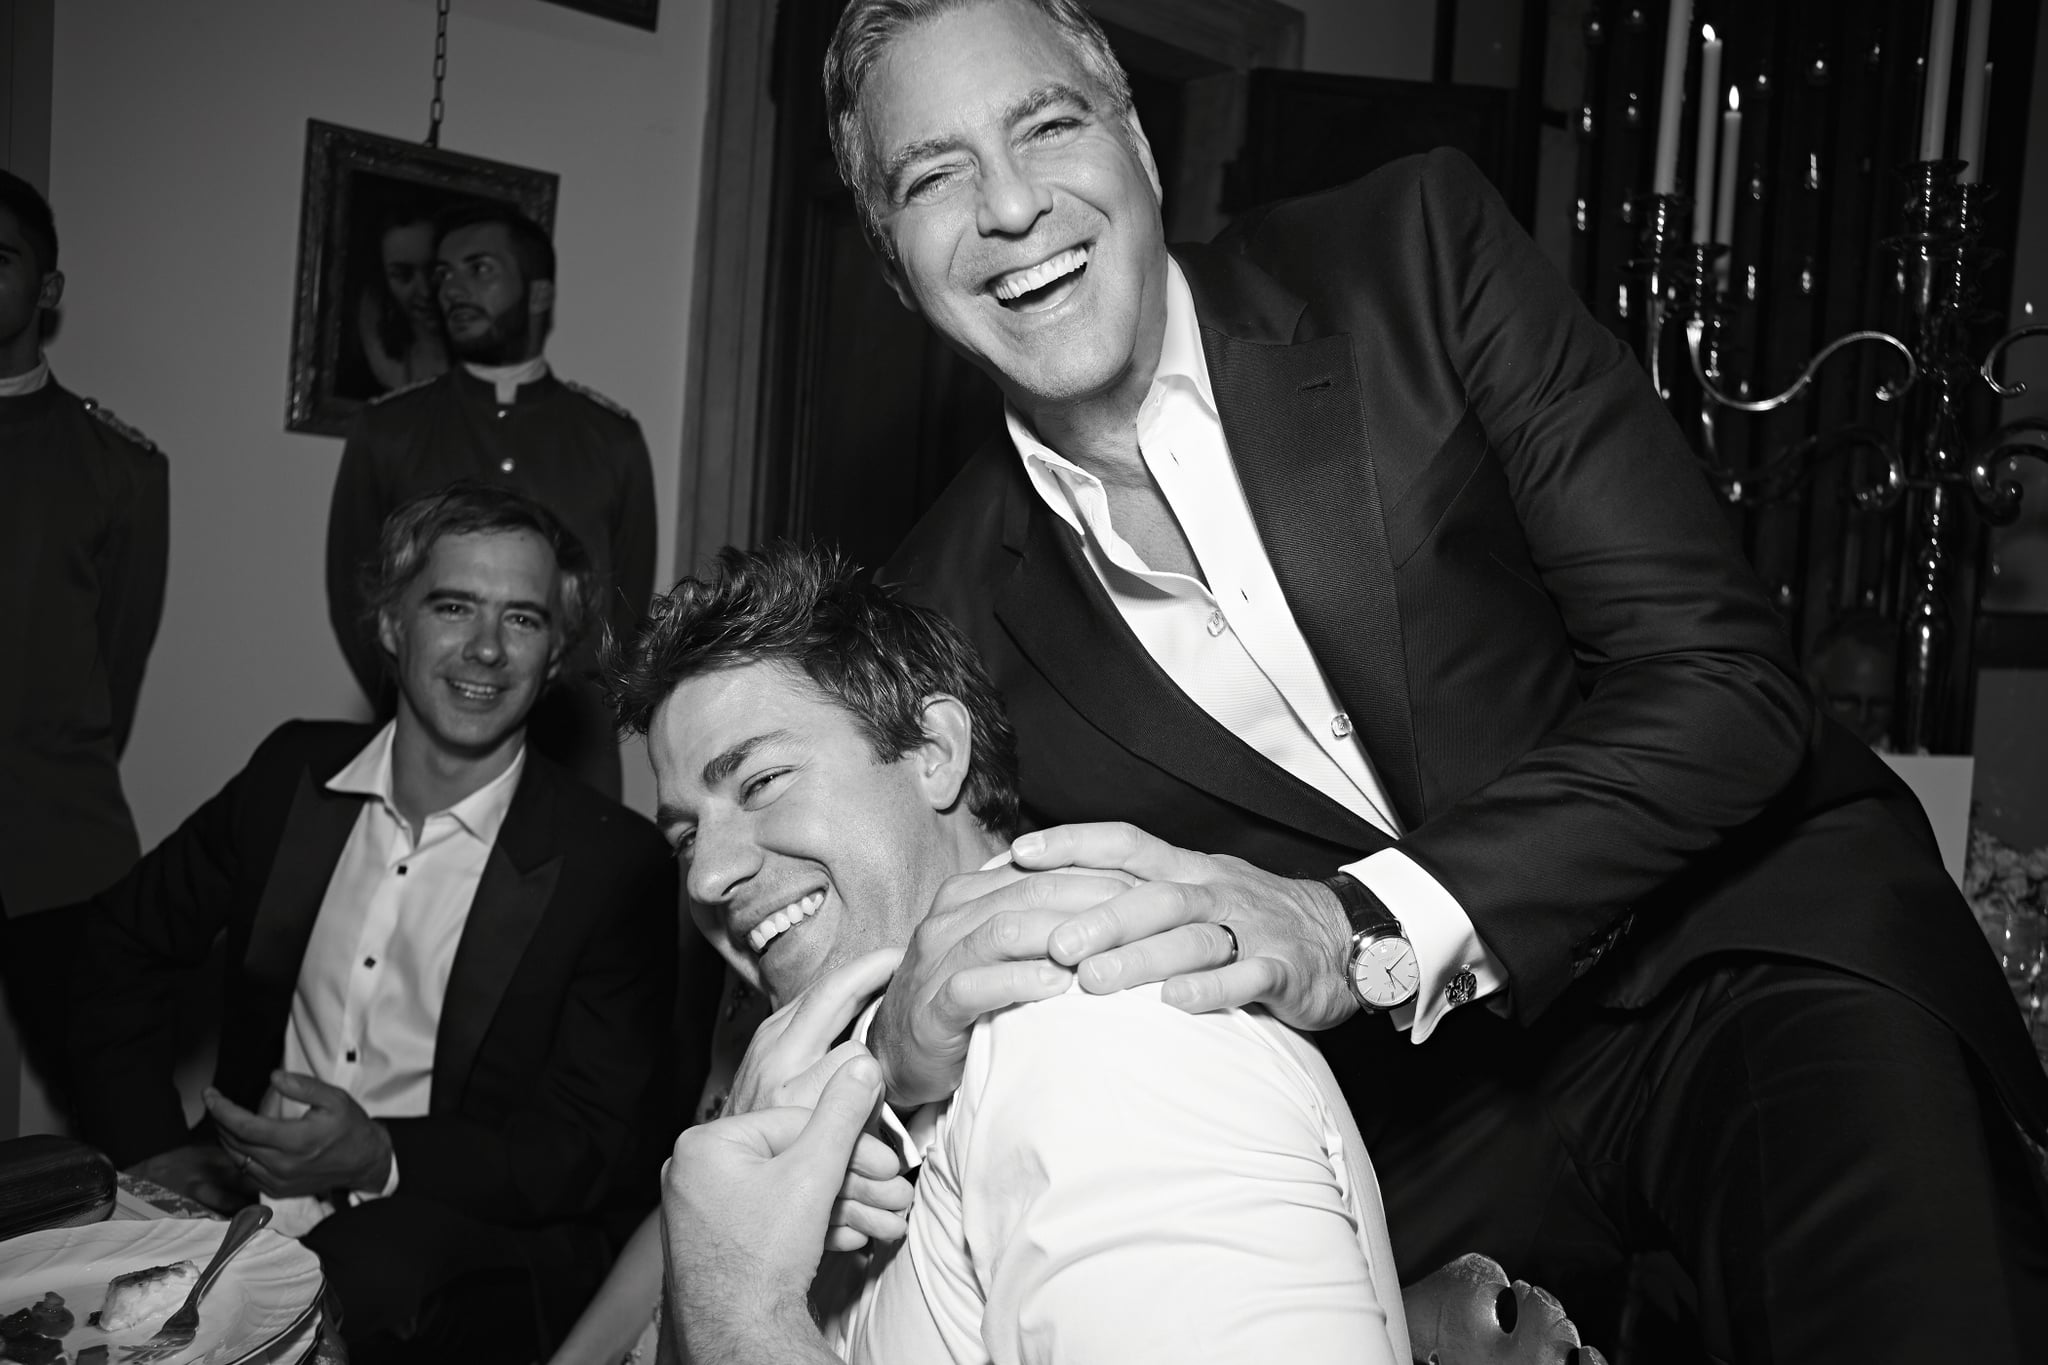 George Clooney Wedding Pictures With Amal Alamuddin Popsugar Celebrity